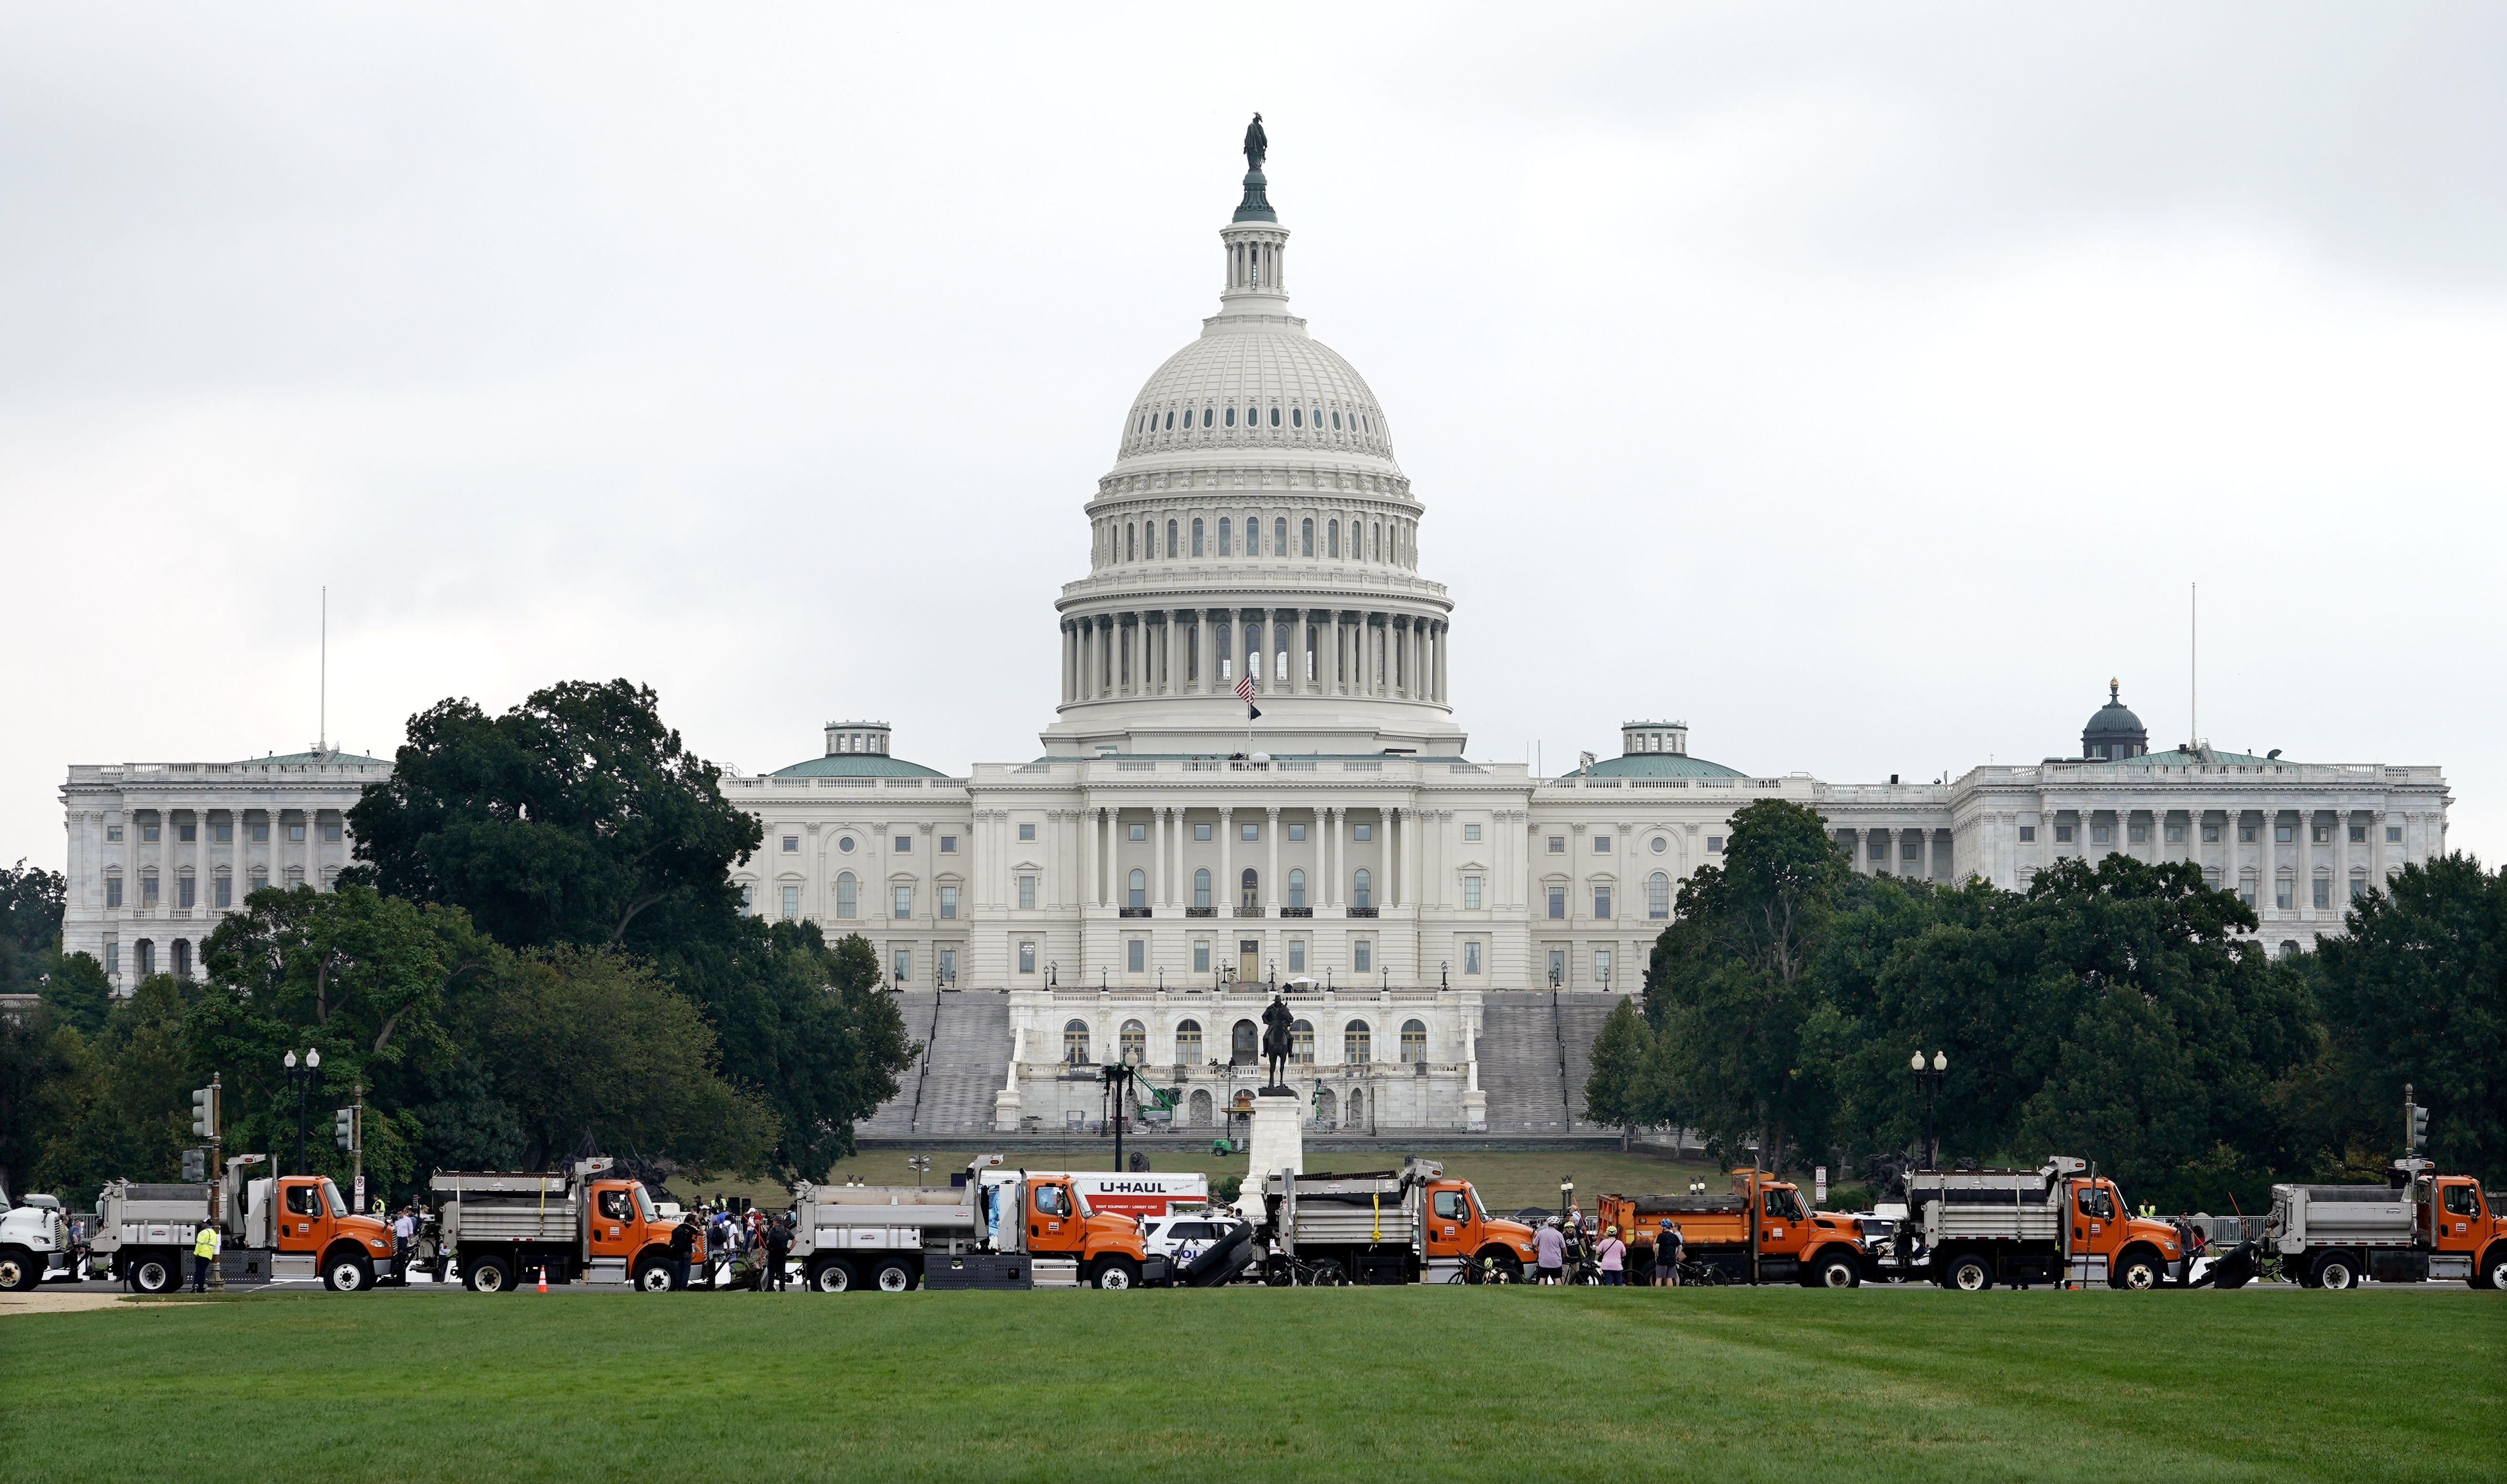 EEUU: Parlamentaria de Senado da revés a plan migratorio